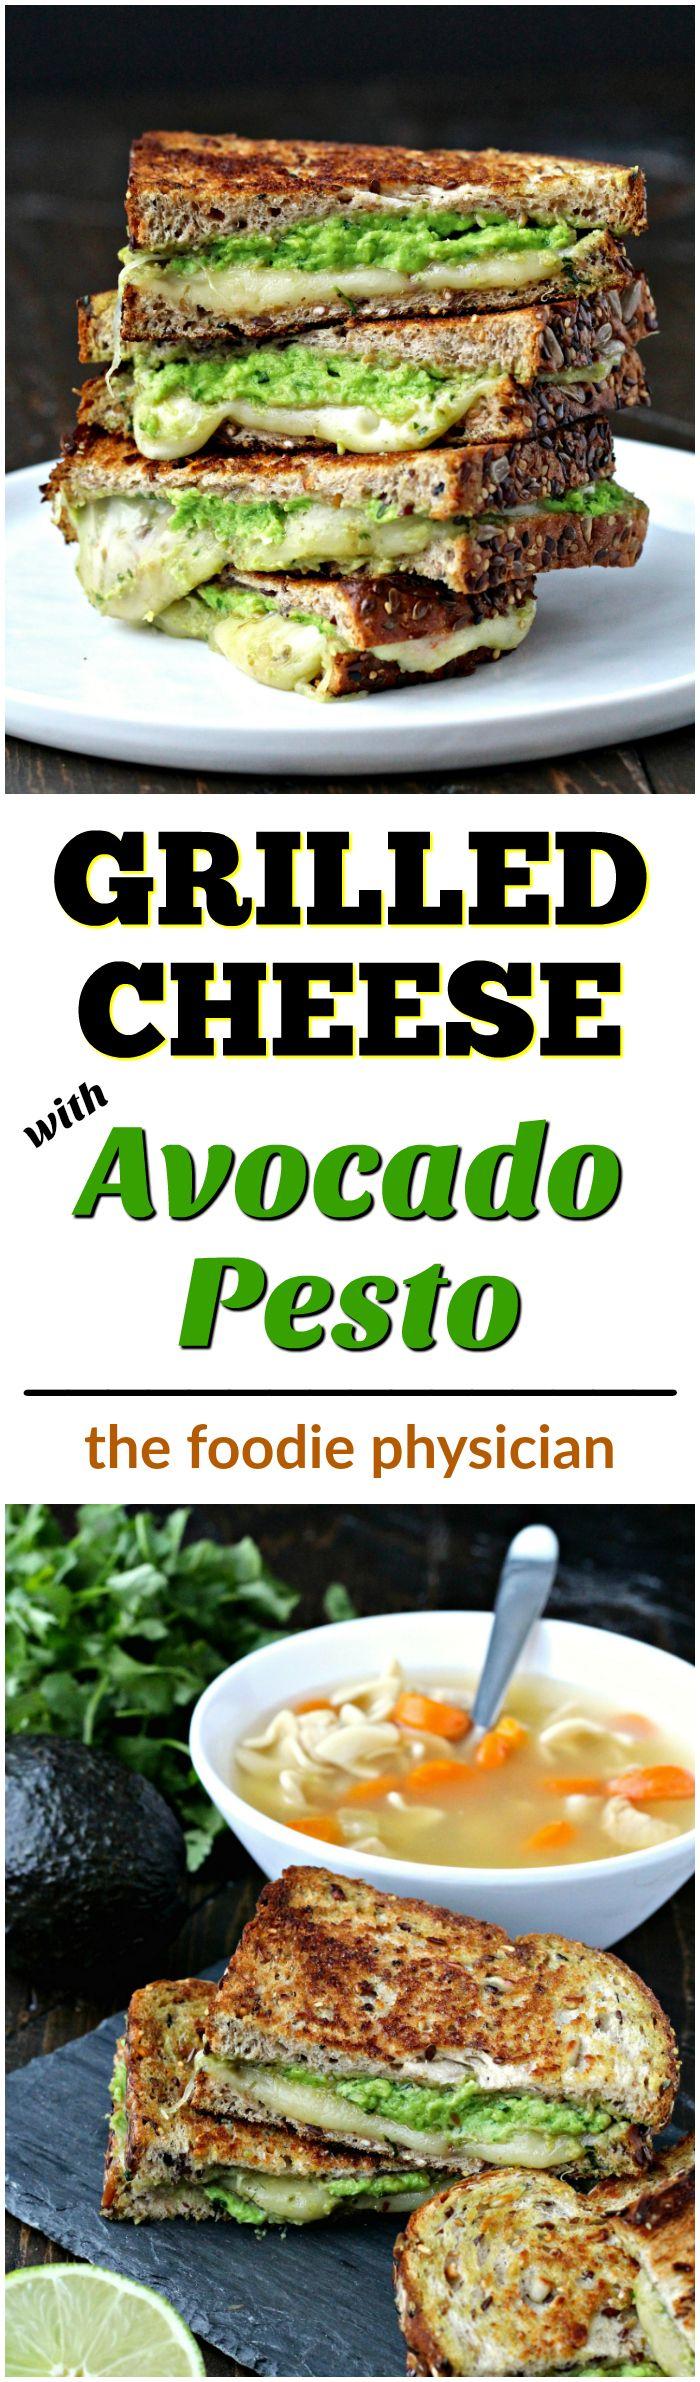 ad grilled cheese with avocado pesto @ foodiephysician avocado pesto ...